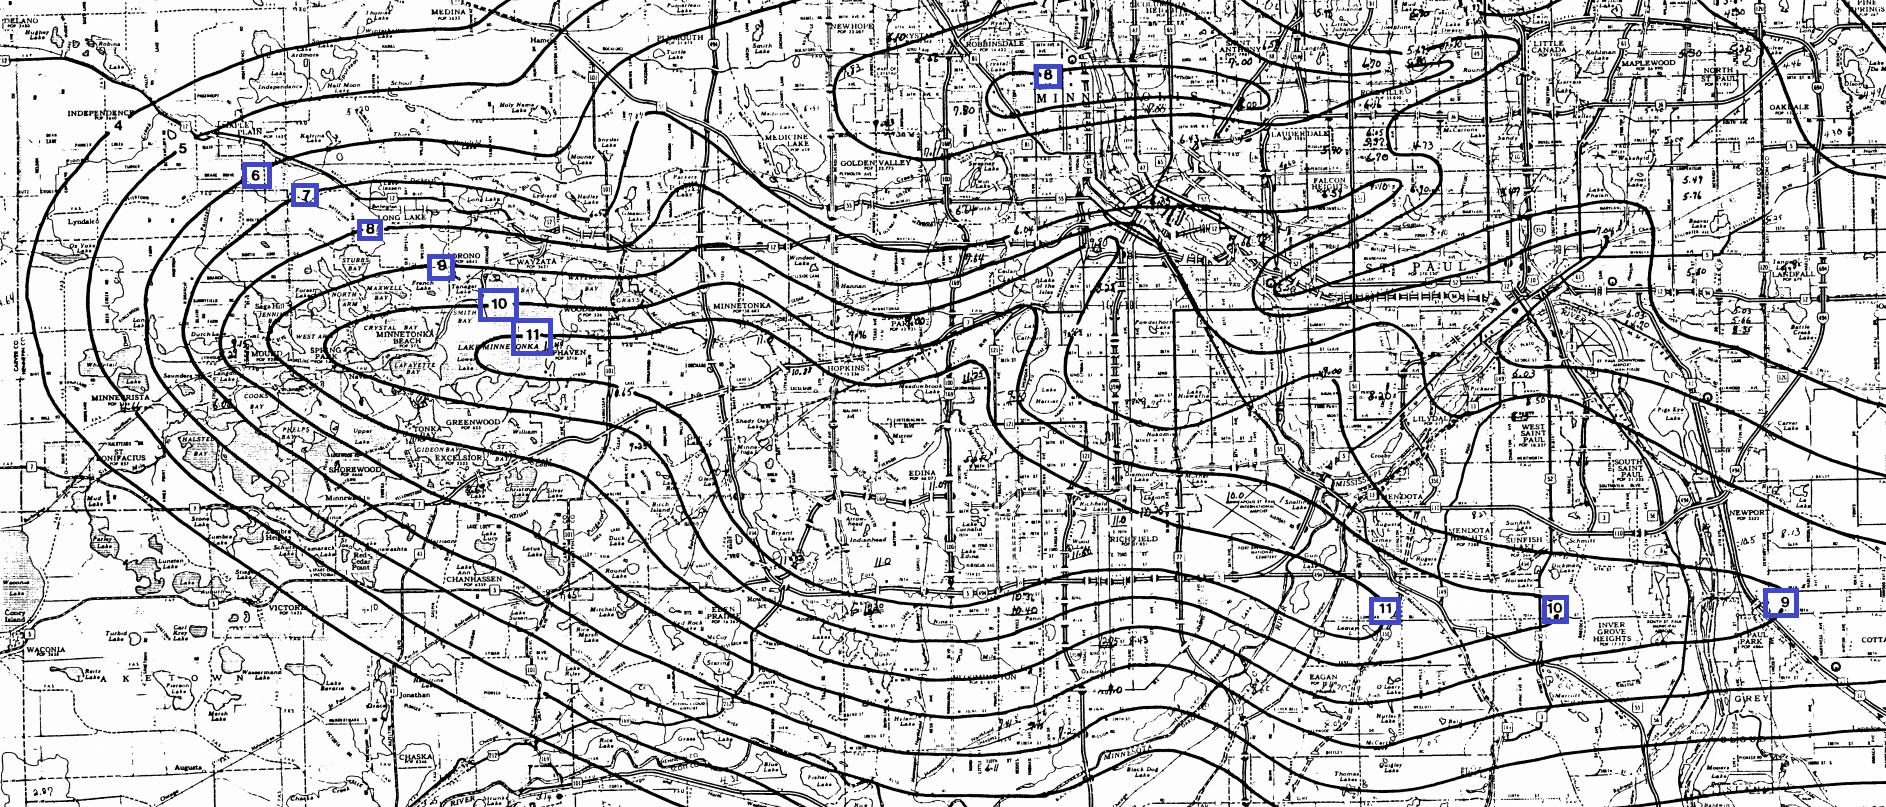 1987 flood map.